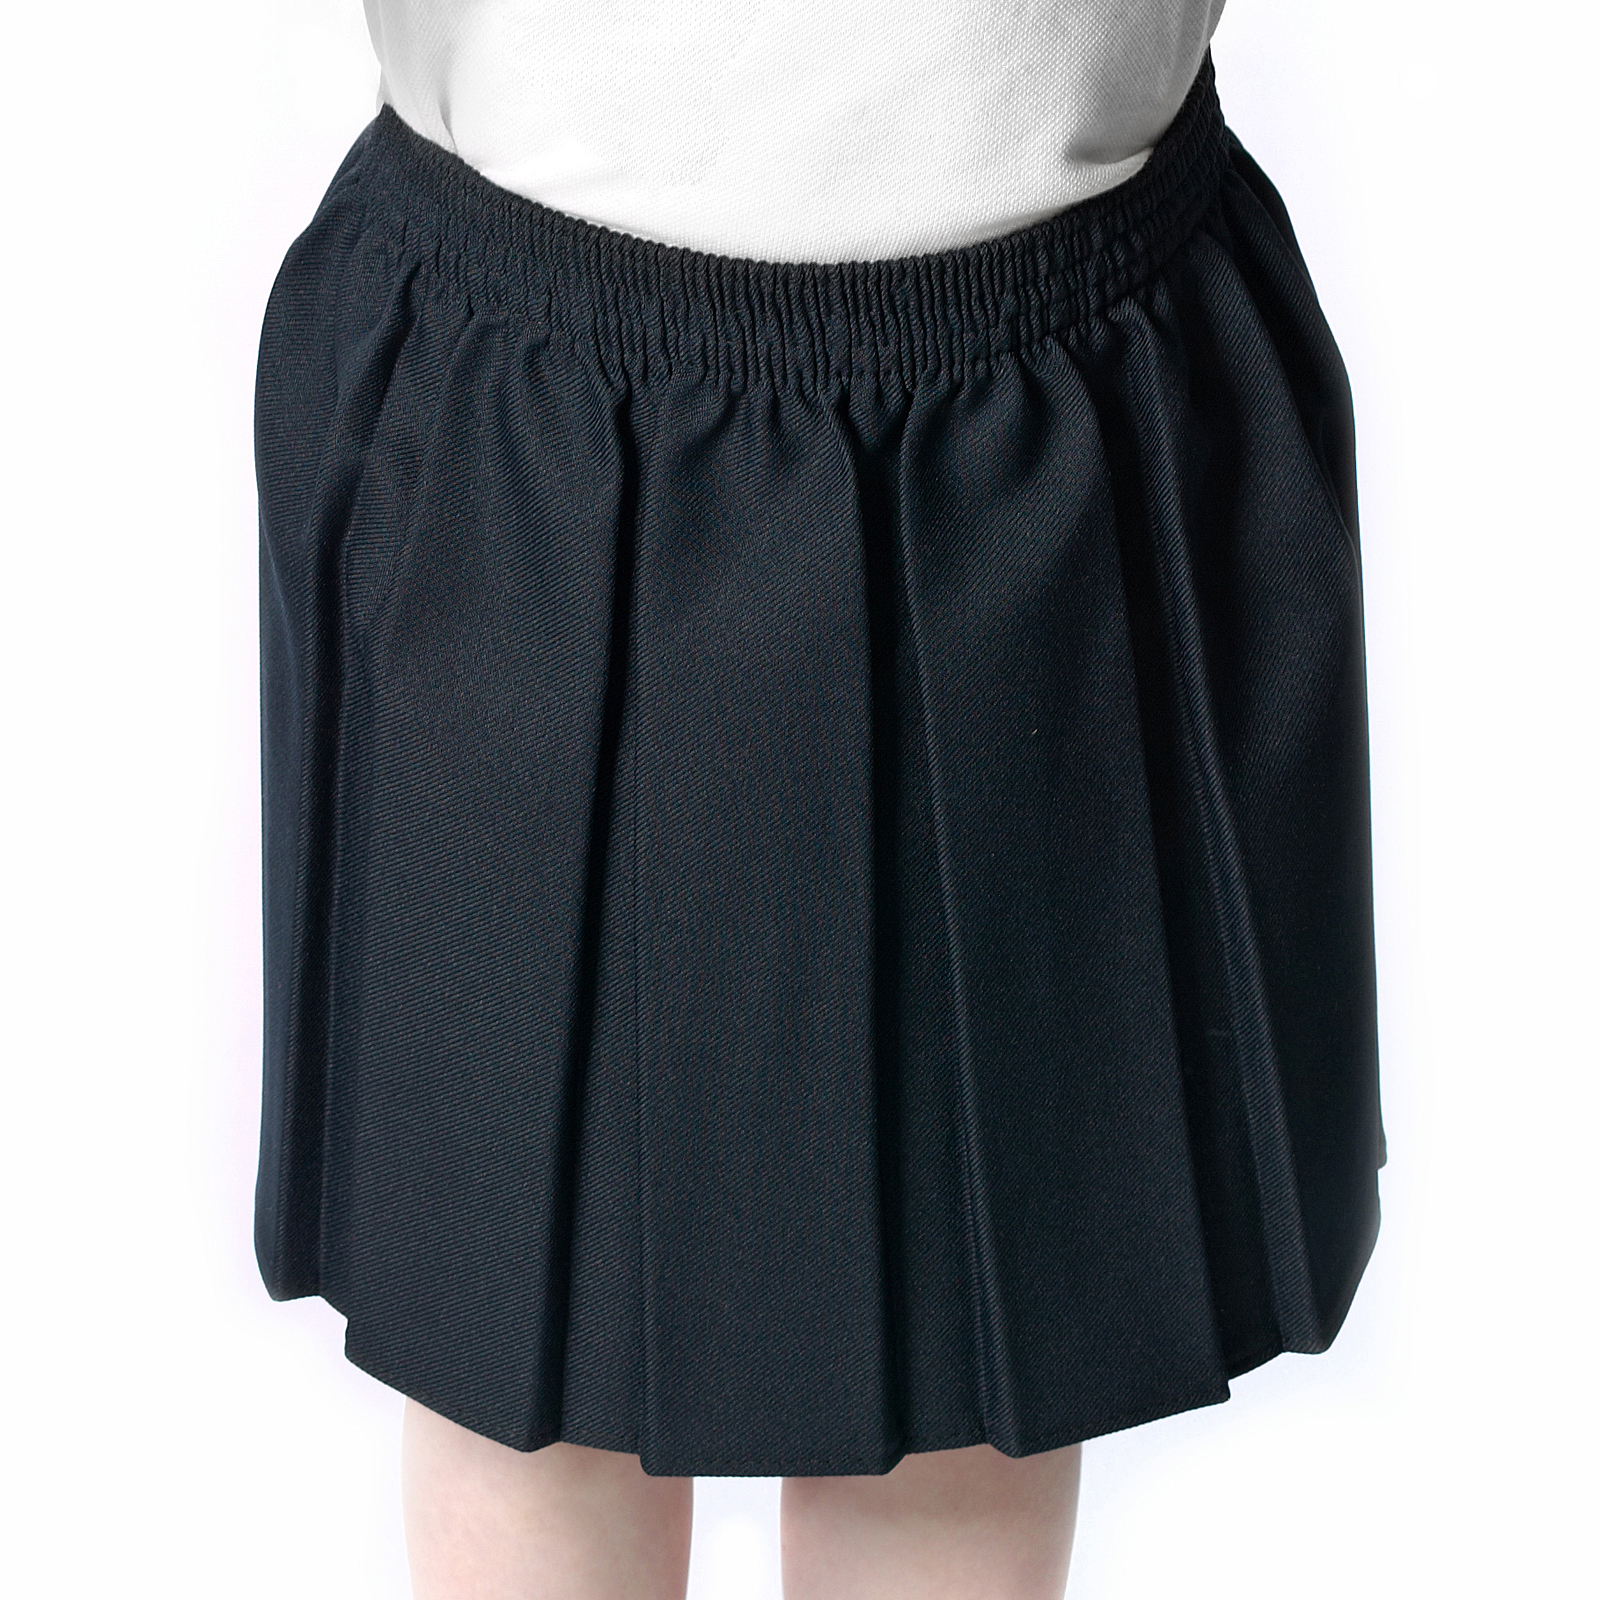 Box Pleat School Skirt - Skirts